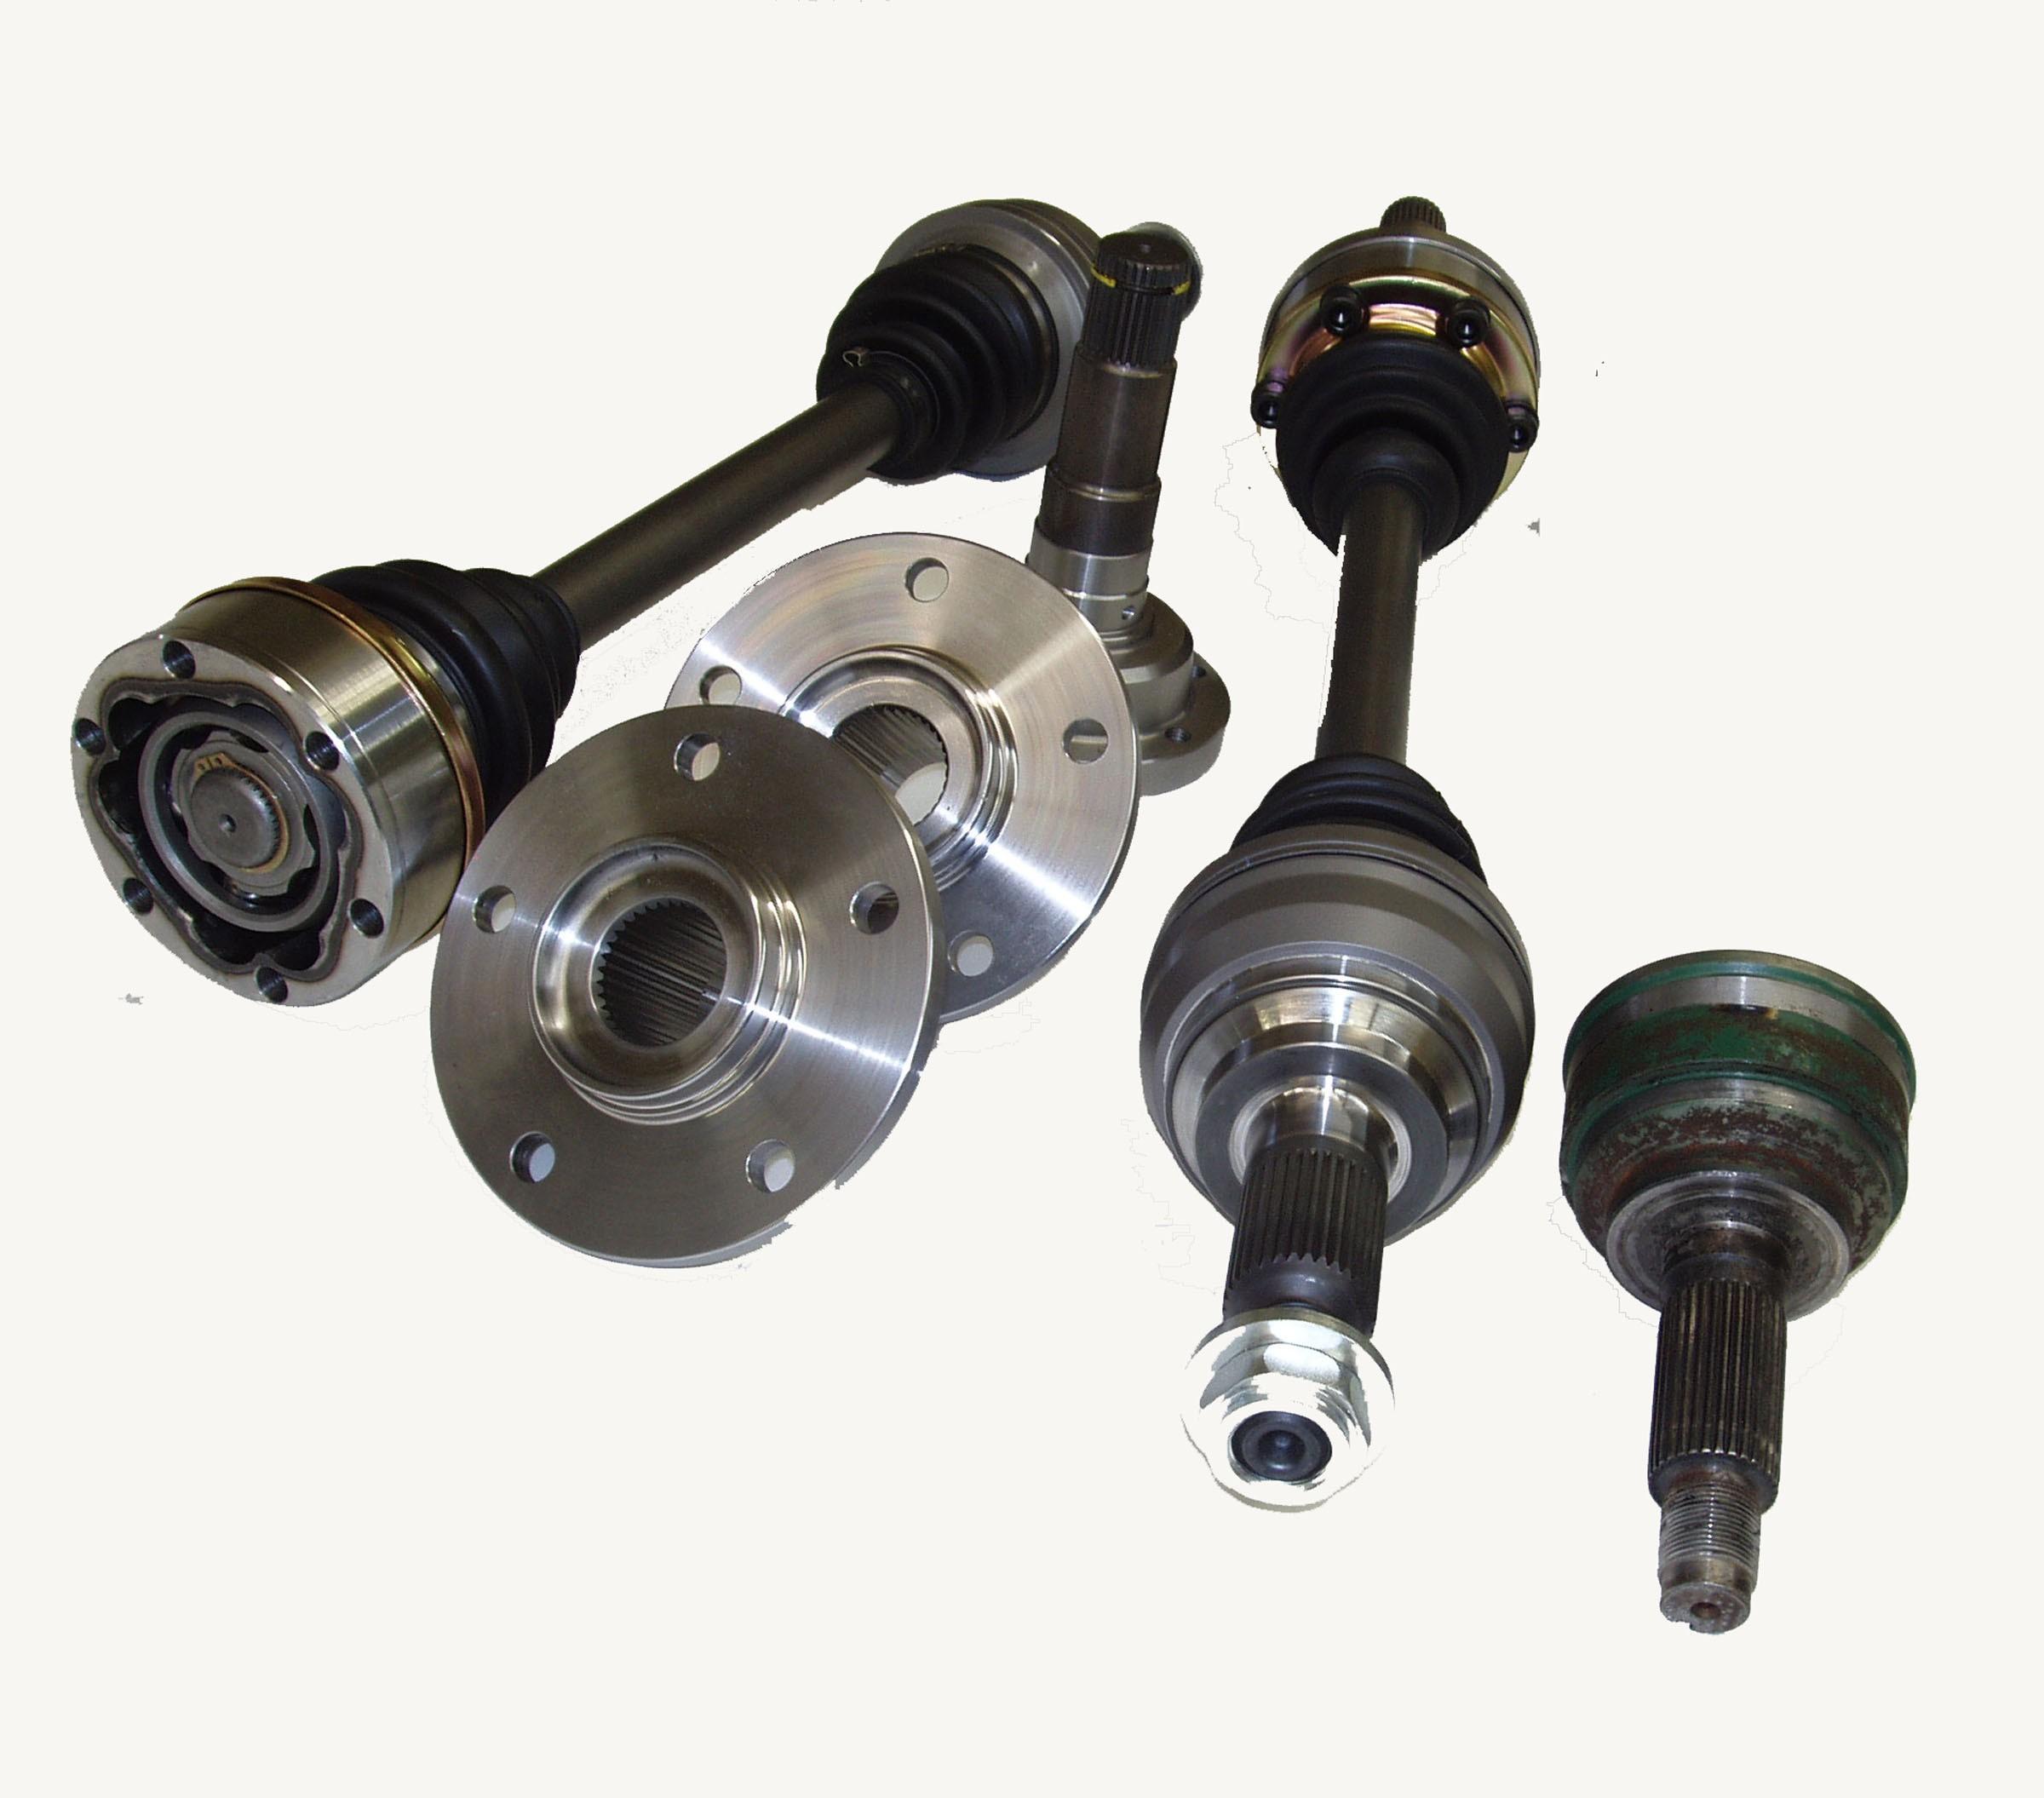 Mazda Evasive Motorsports 93 Rx 7 Wiring Harness The Driveshaft Shop Pro Level Axle Hub Kit Rx7 95